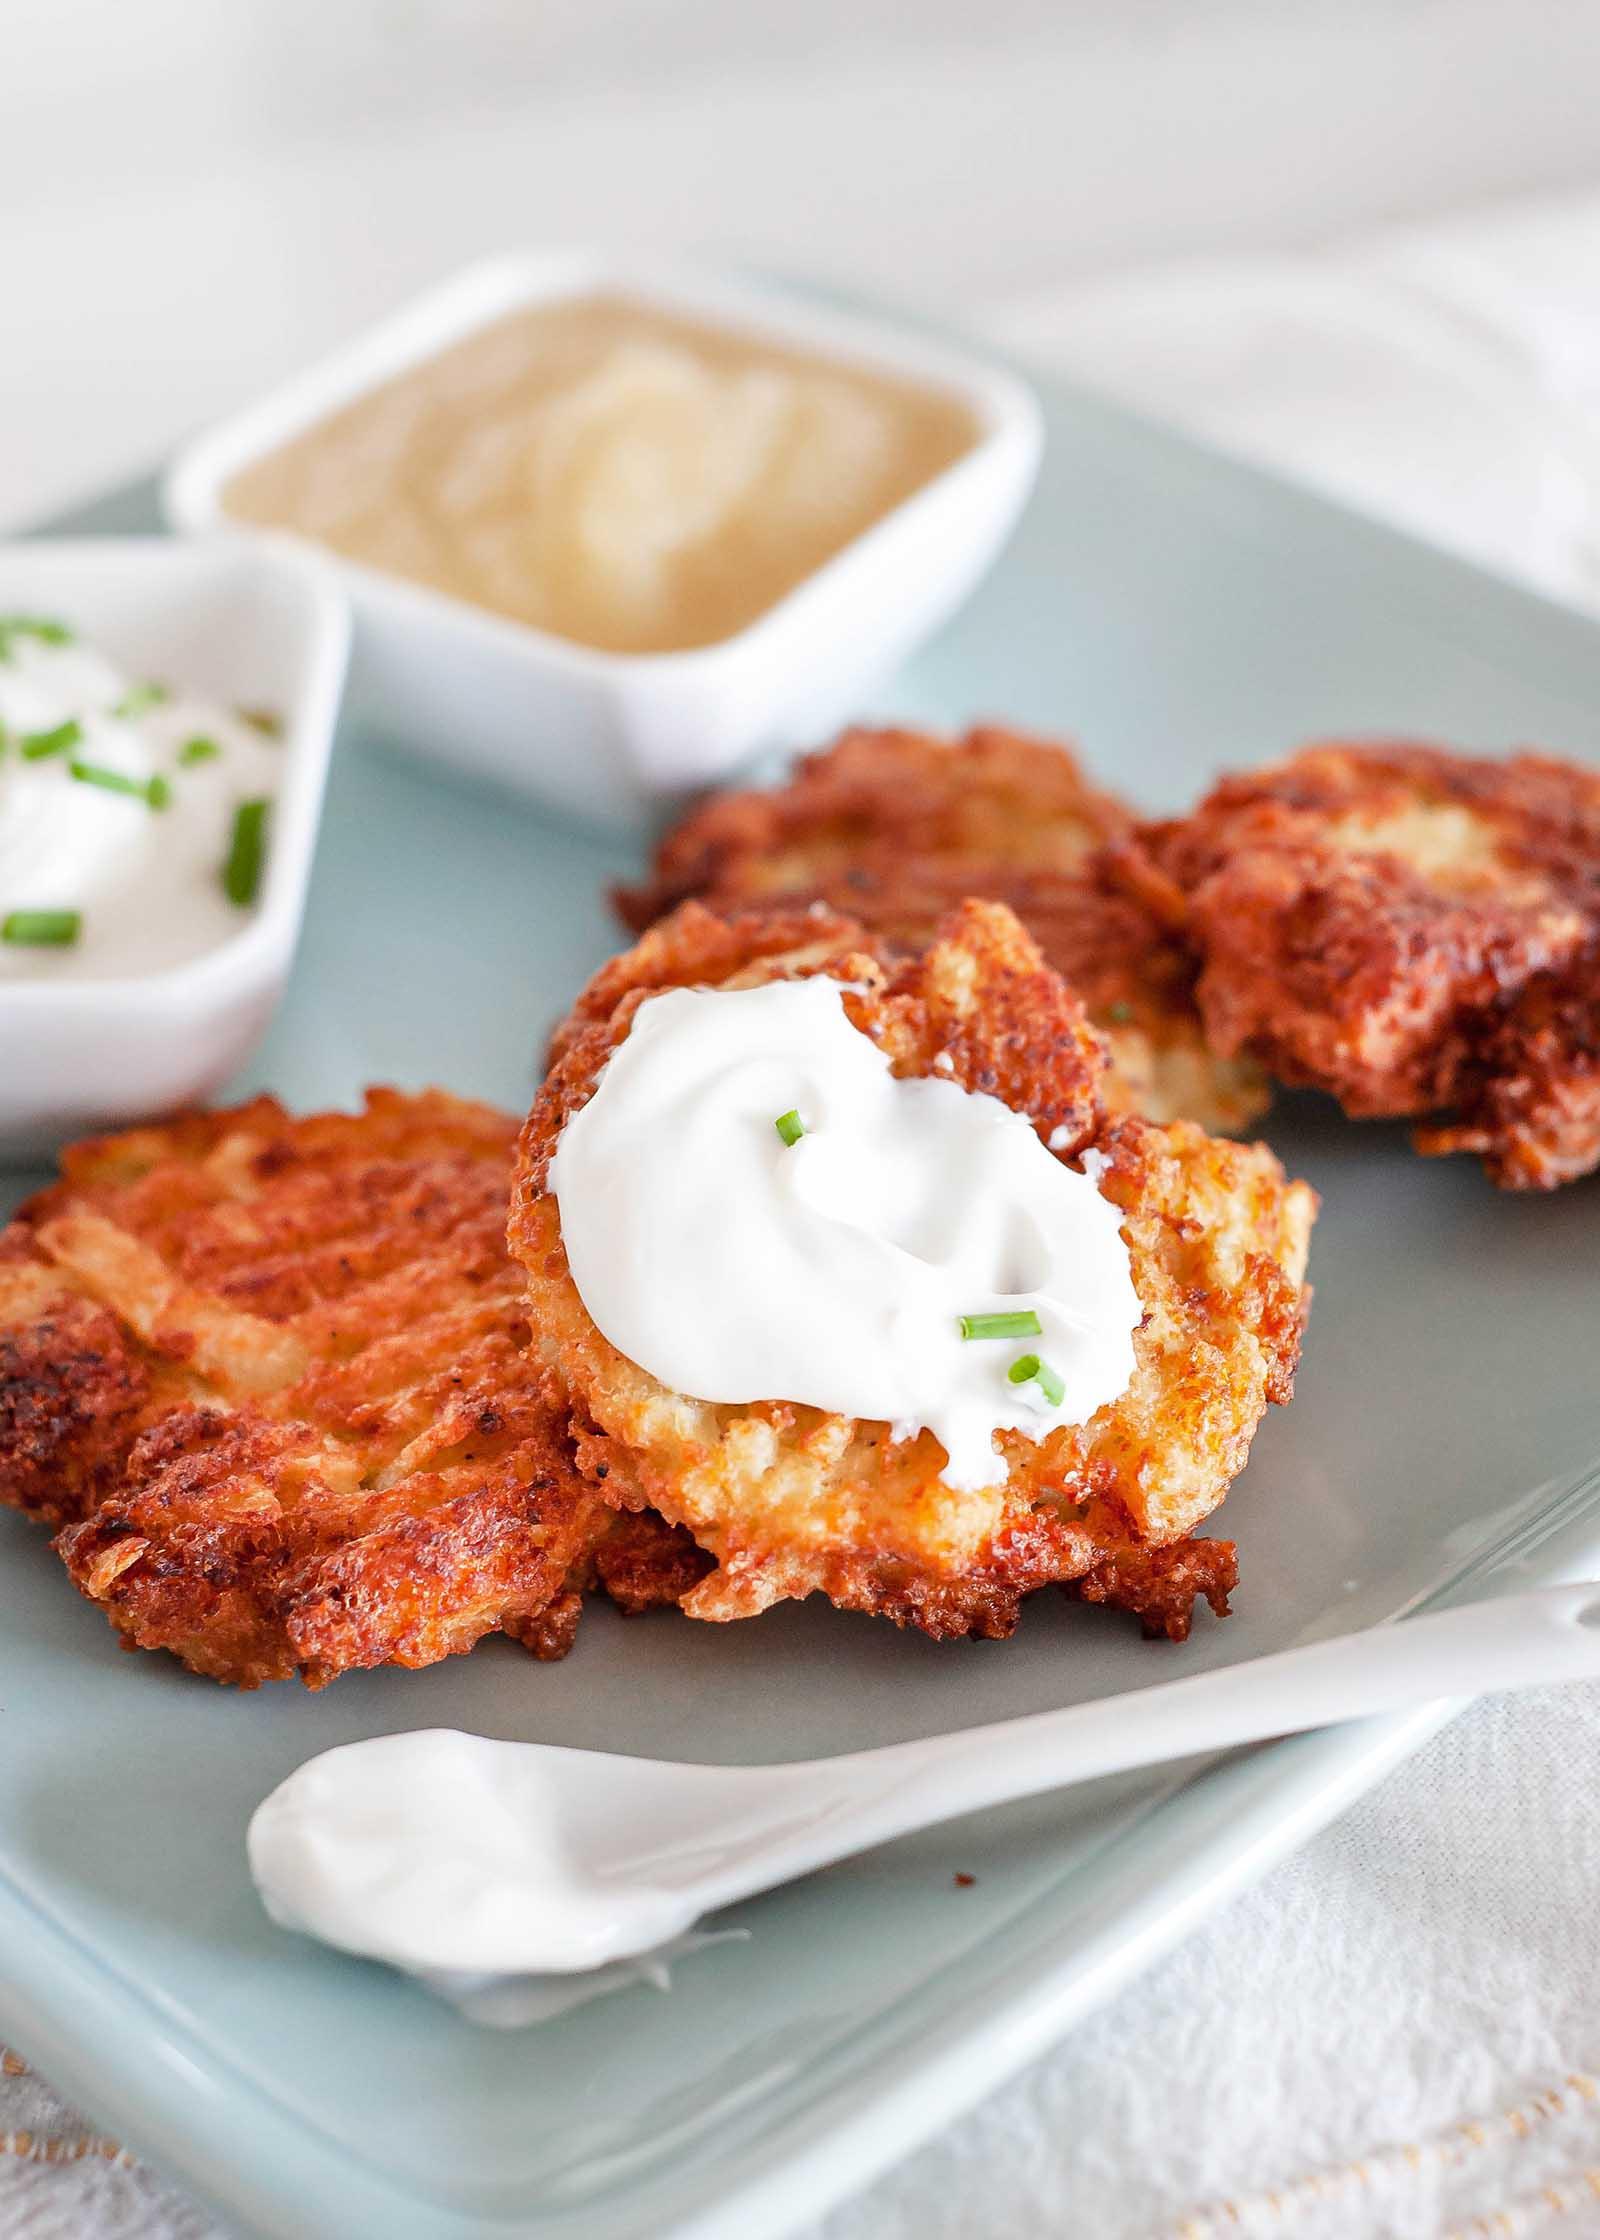 Easy potato latkes for hanukkah on a platter spread with sour cream